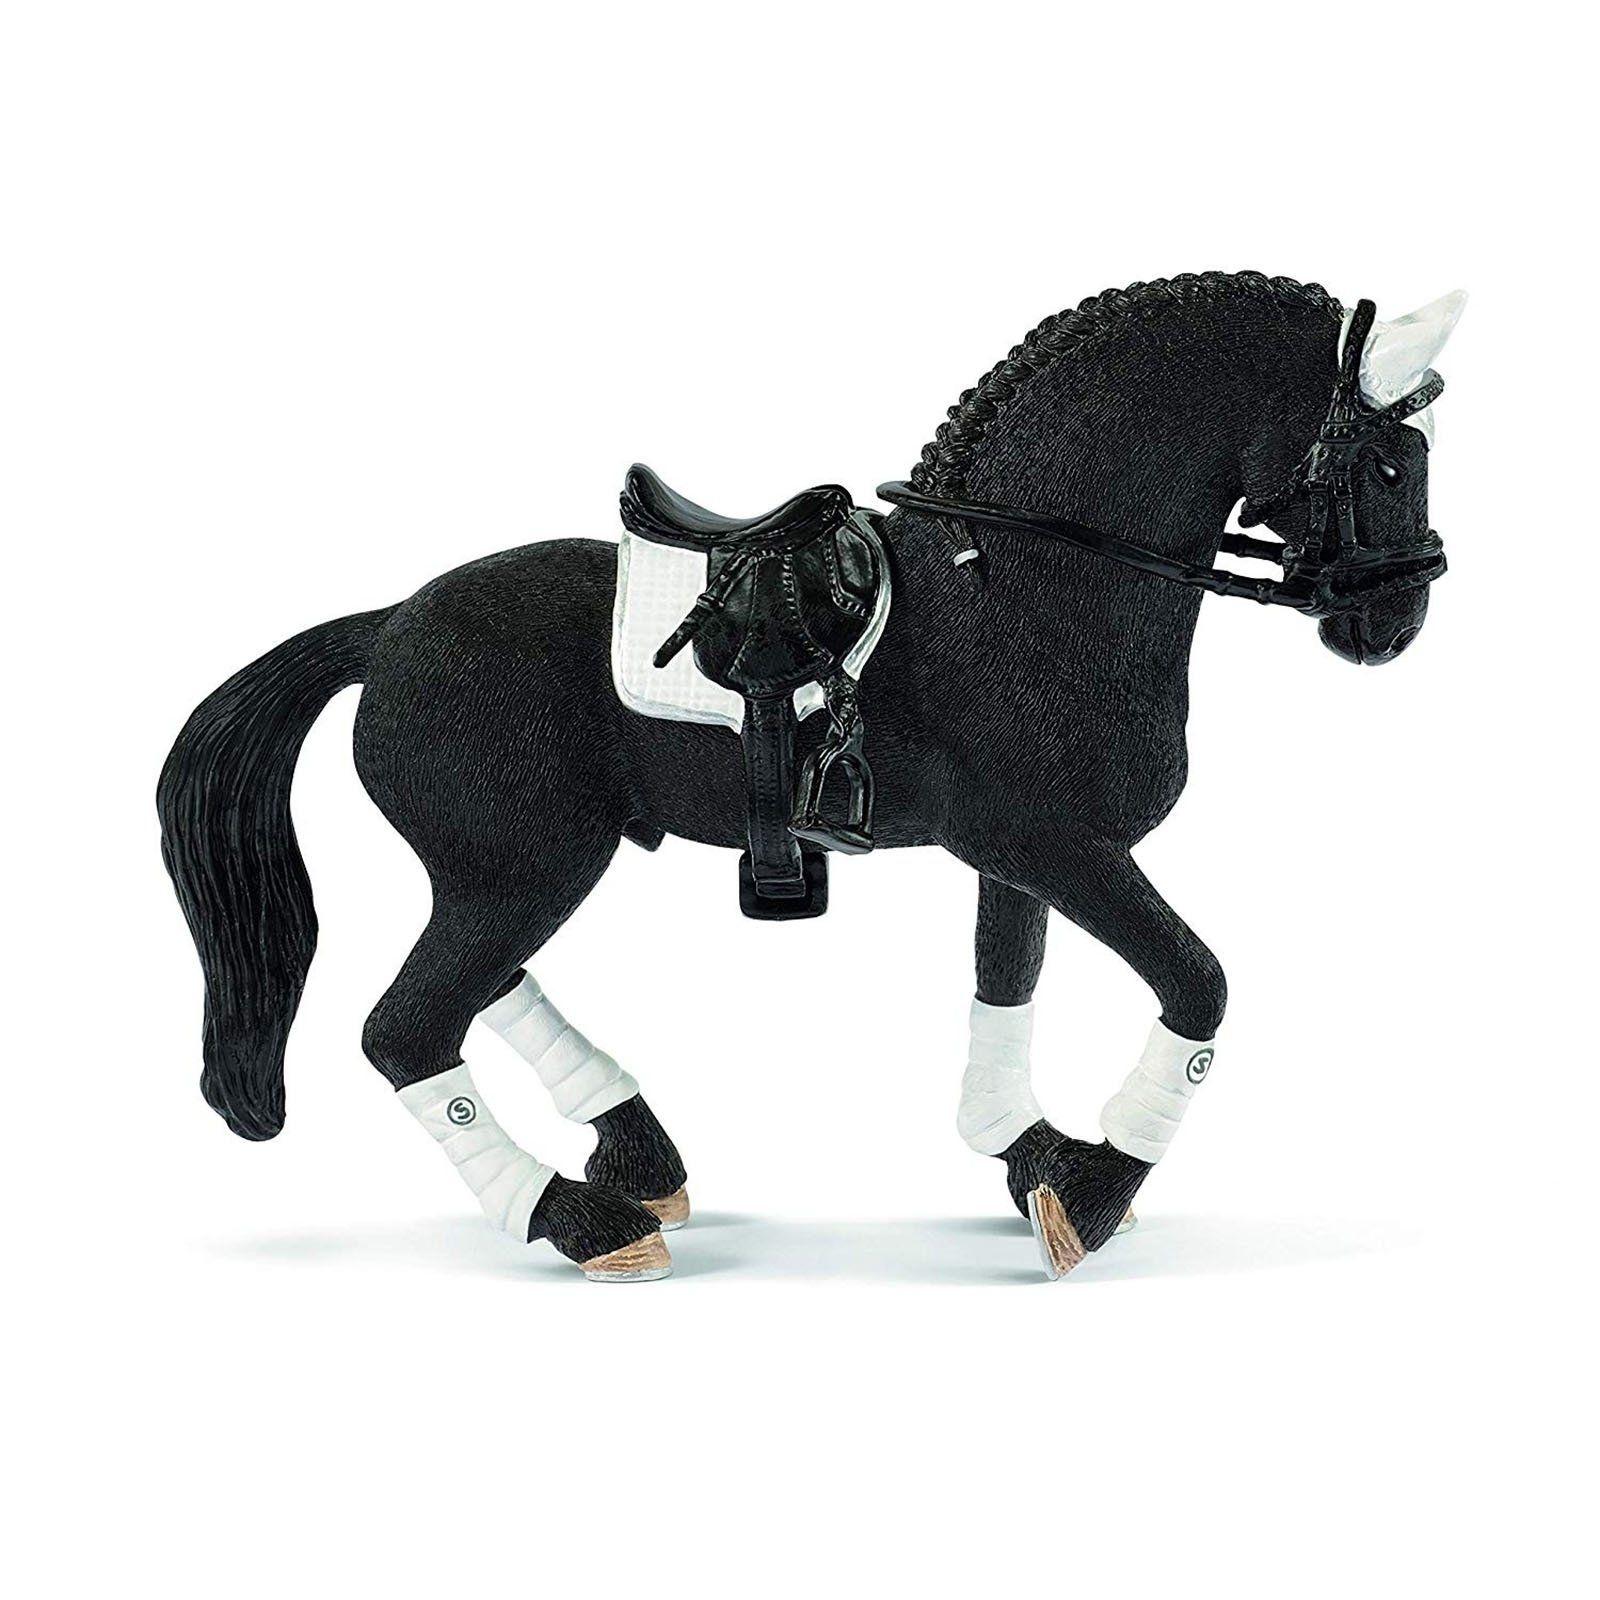 Schleich Horse Club Frisian Stallion Riding Tournament Toy Animal Figure Multicolor Schleich Horses Friesian Stallion